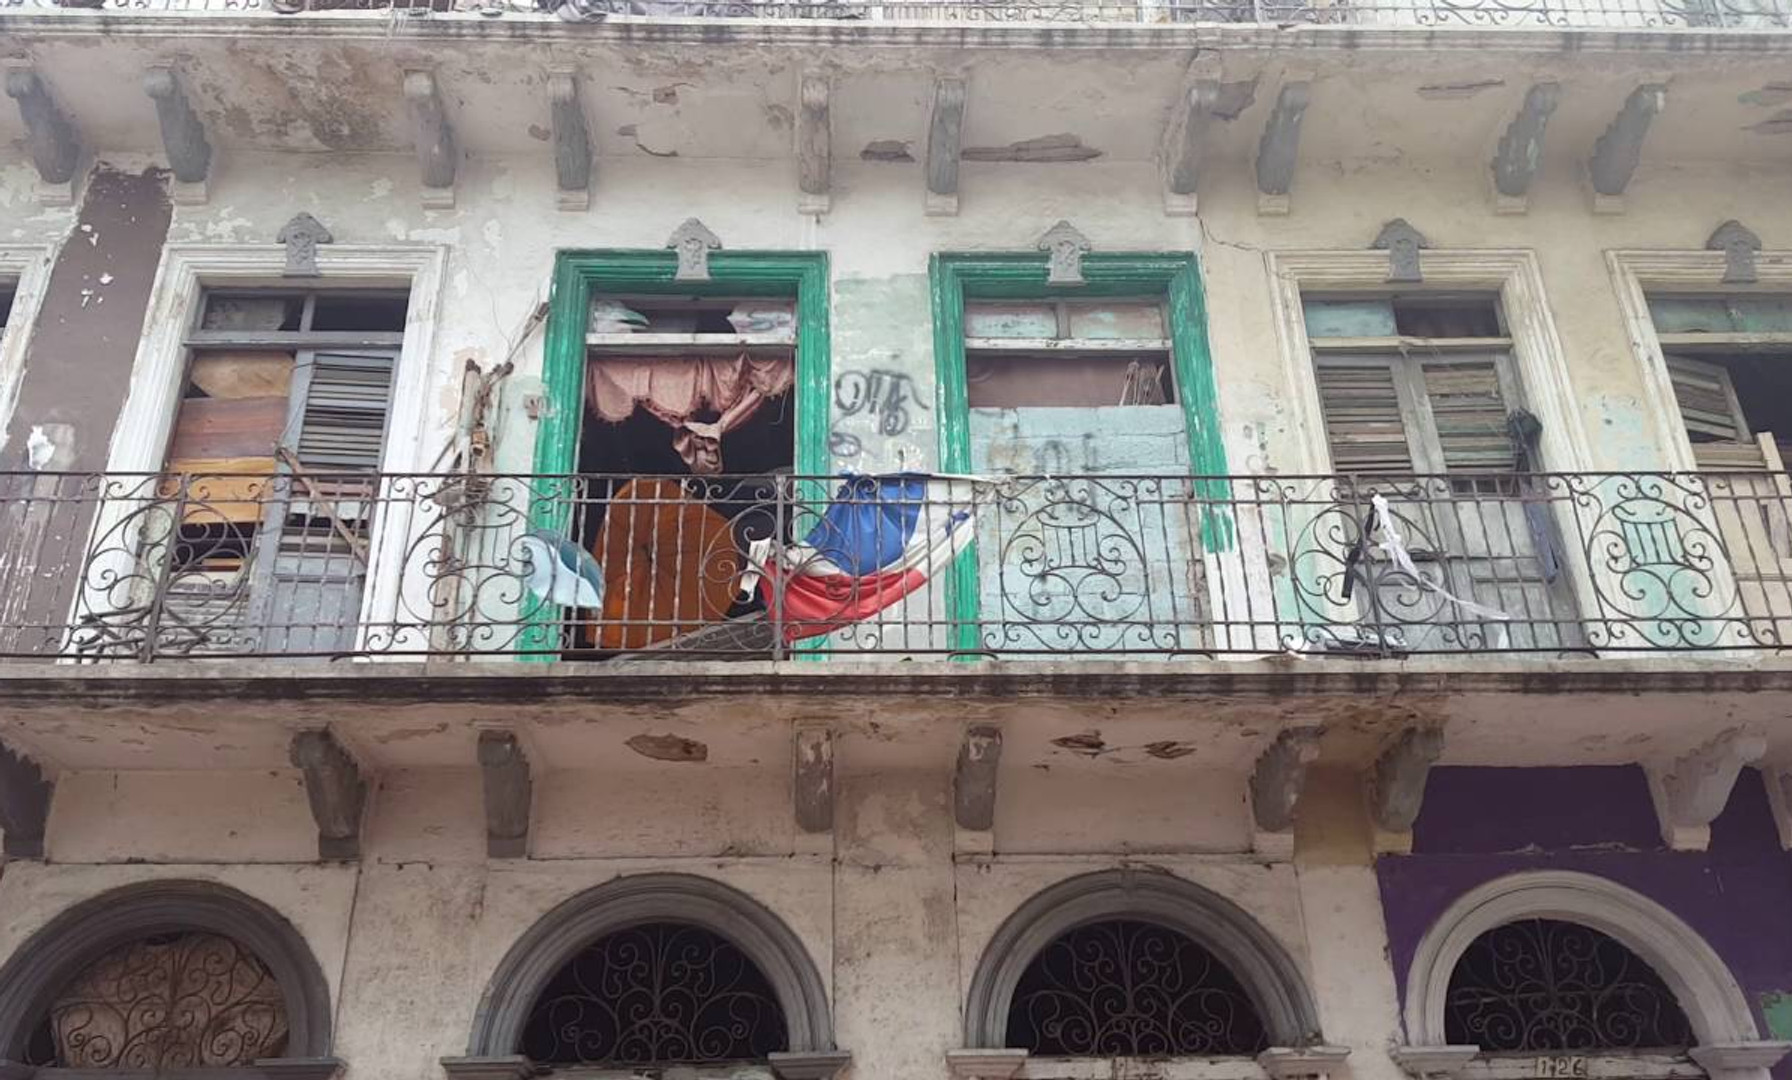 Panama Flag Waving in the Afternoon Breeze; Panama City, Panama